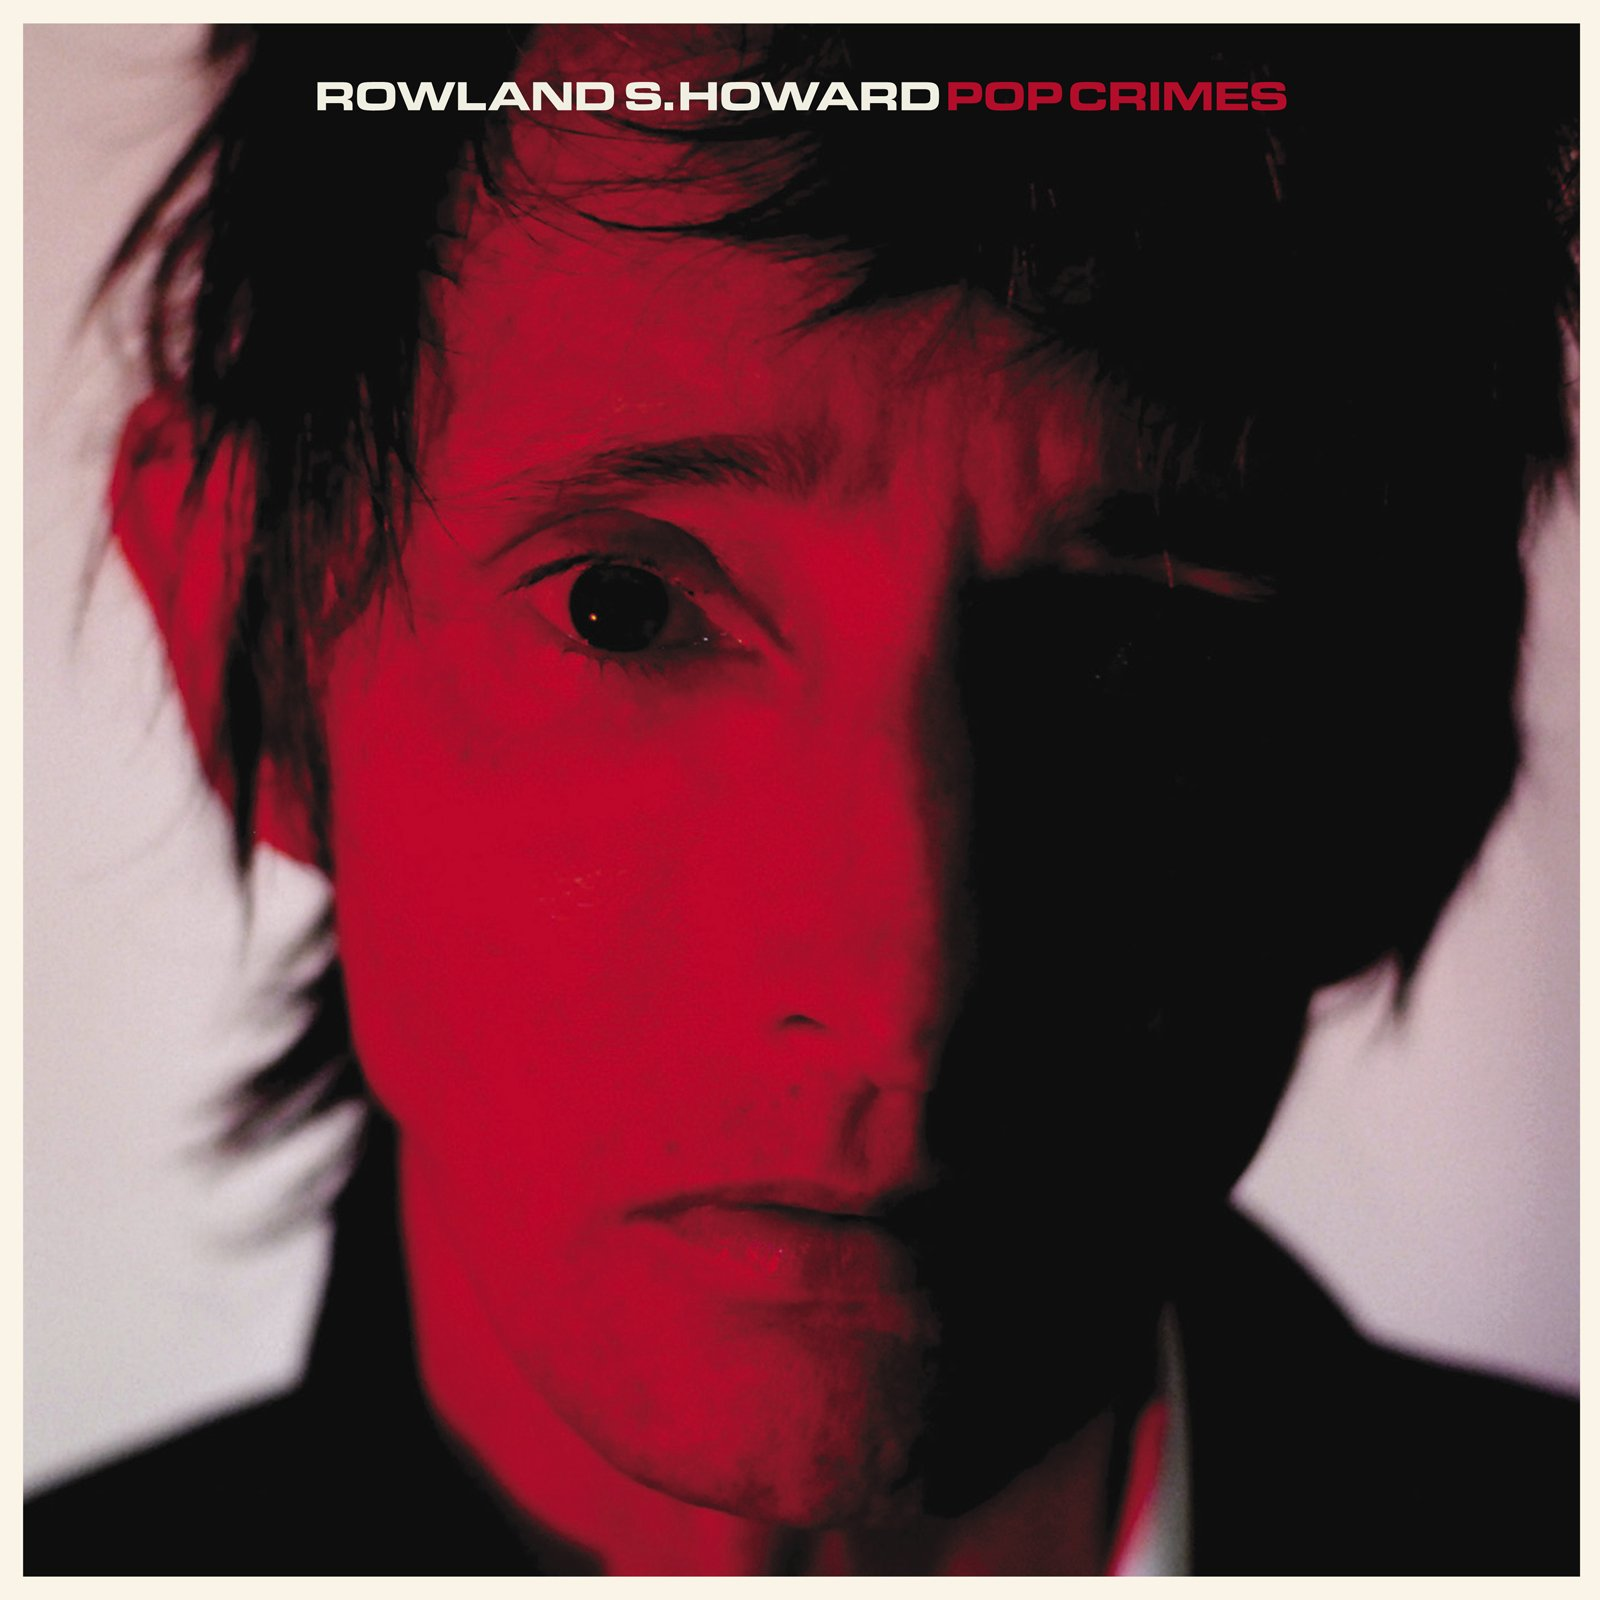 Rowland S. Howard - Pop Crimes (LP Vinyl)